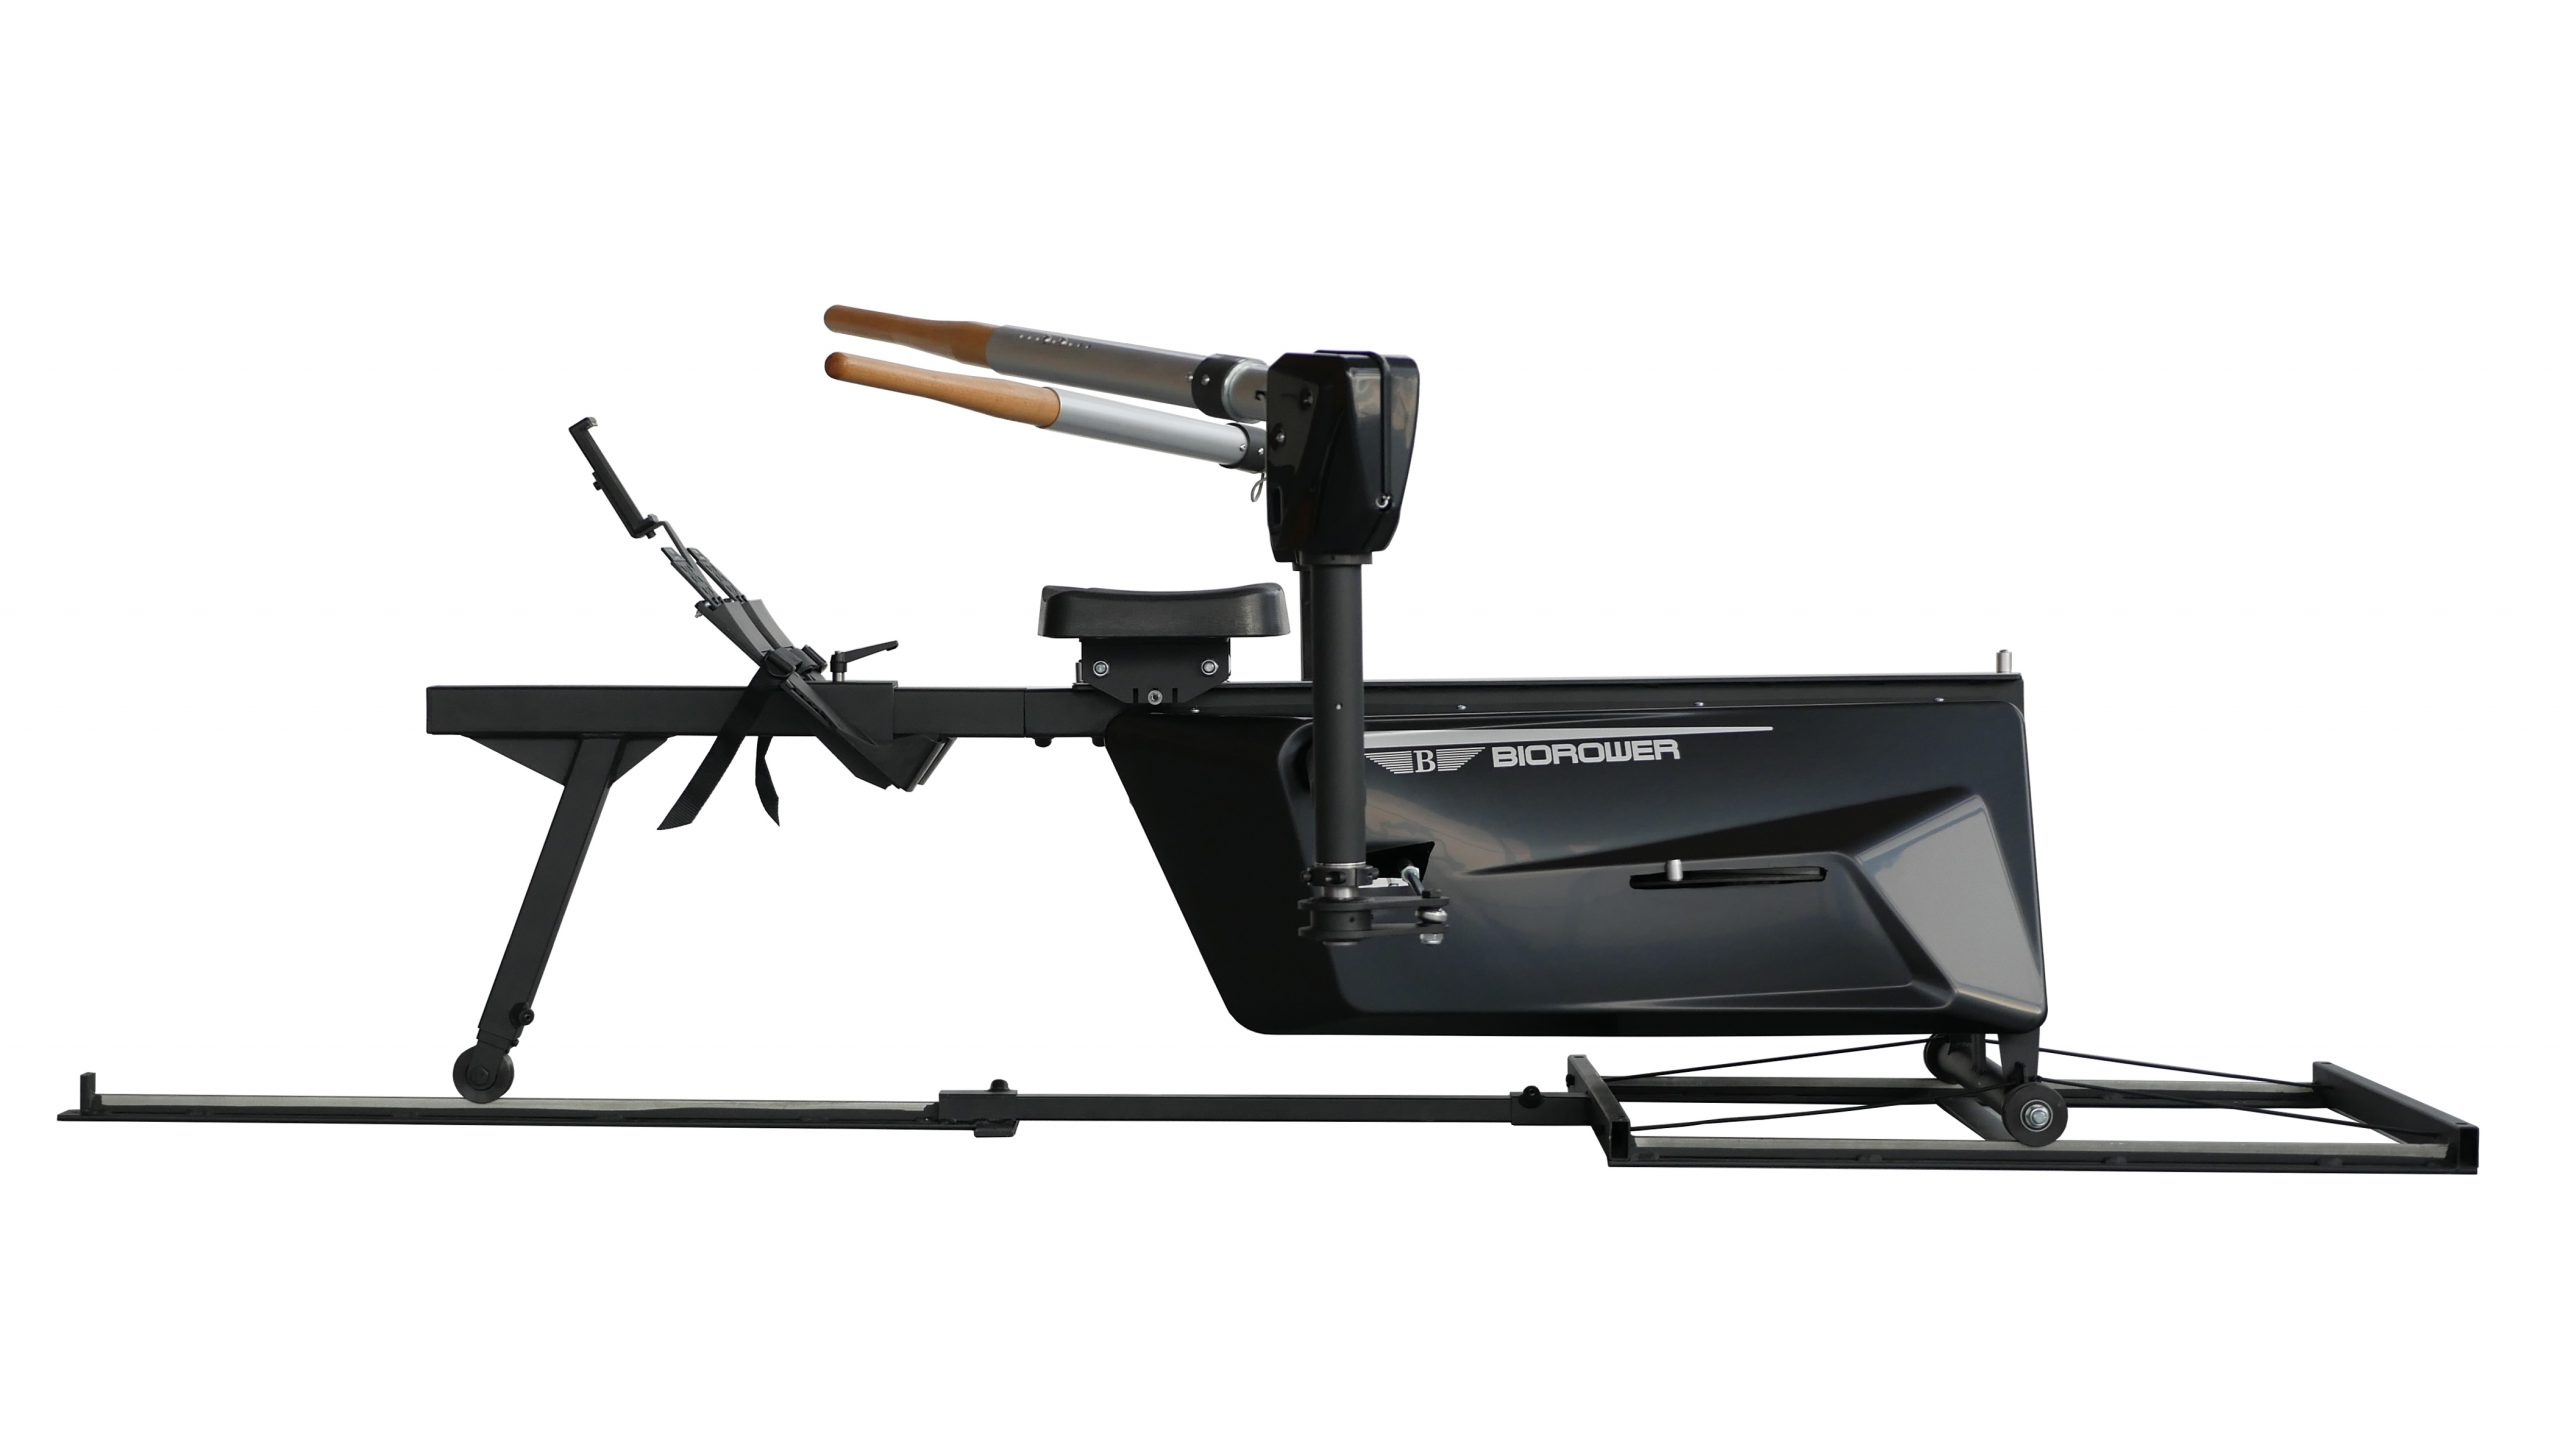 true rowing simulator Biorower S1club